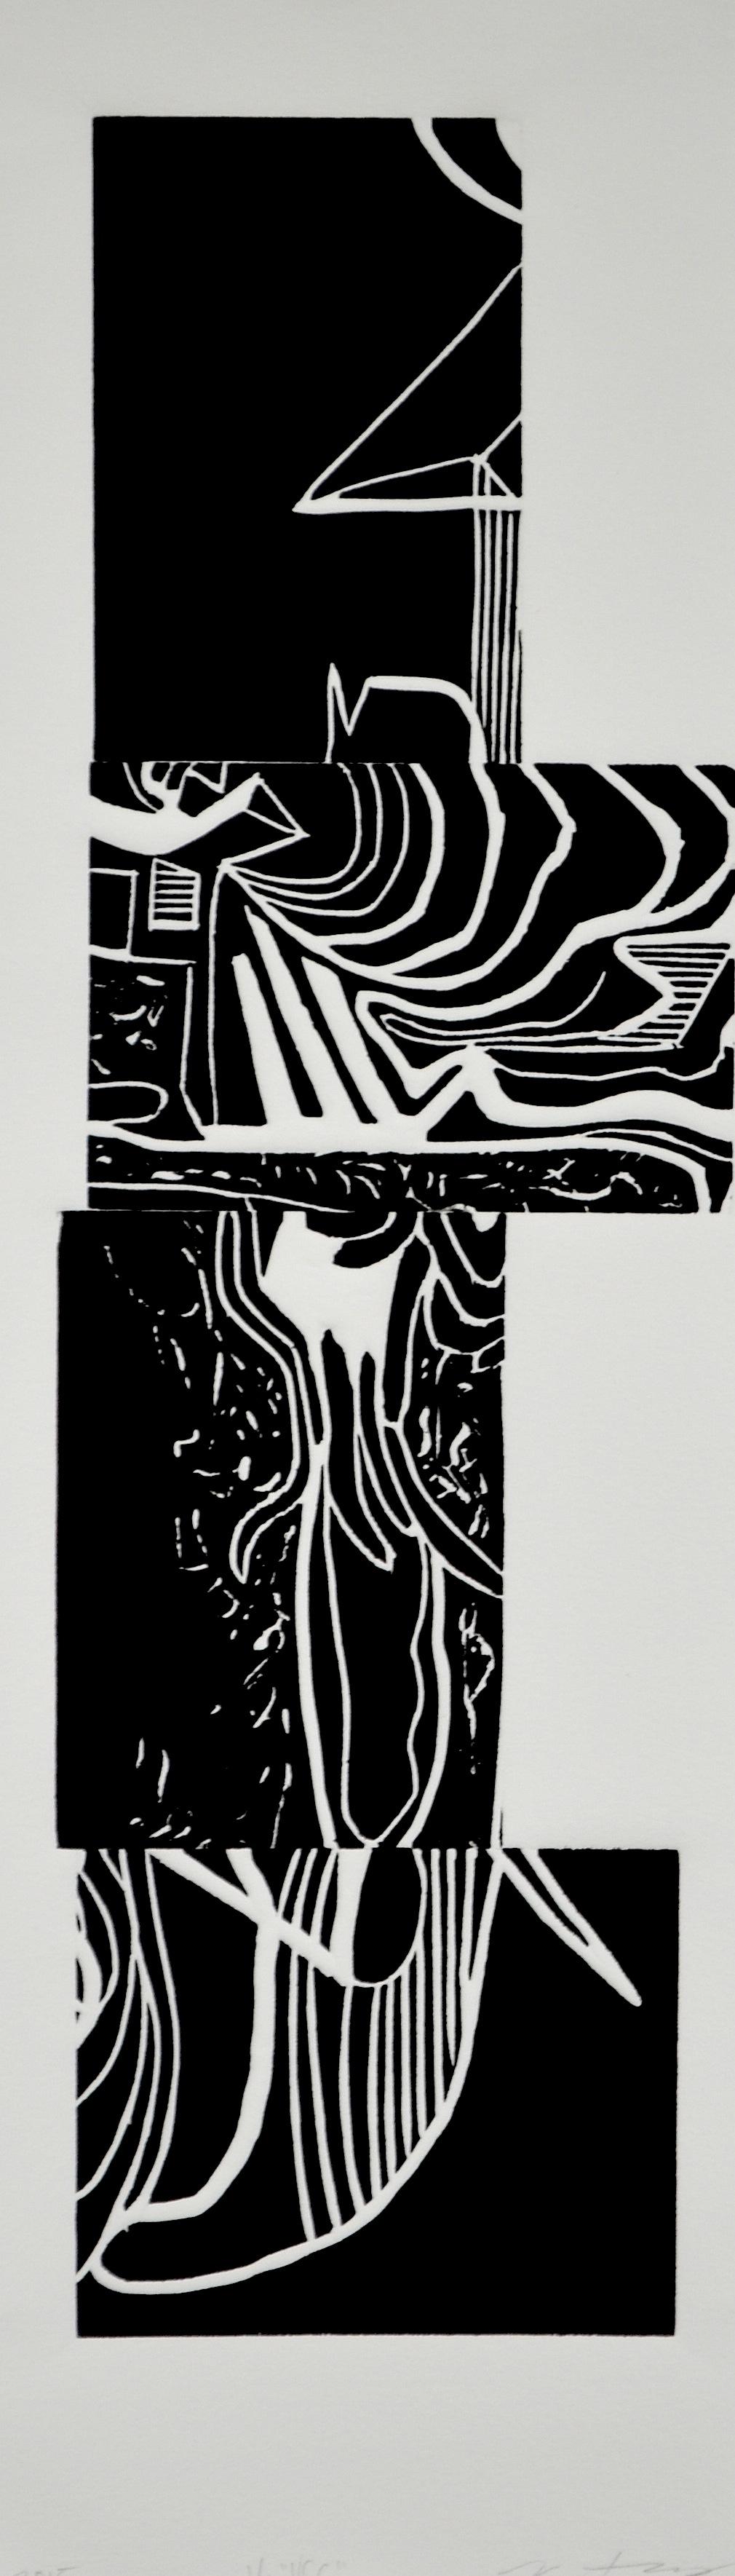 20x6.JPG